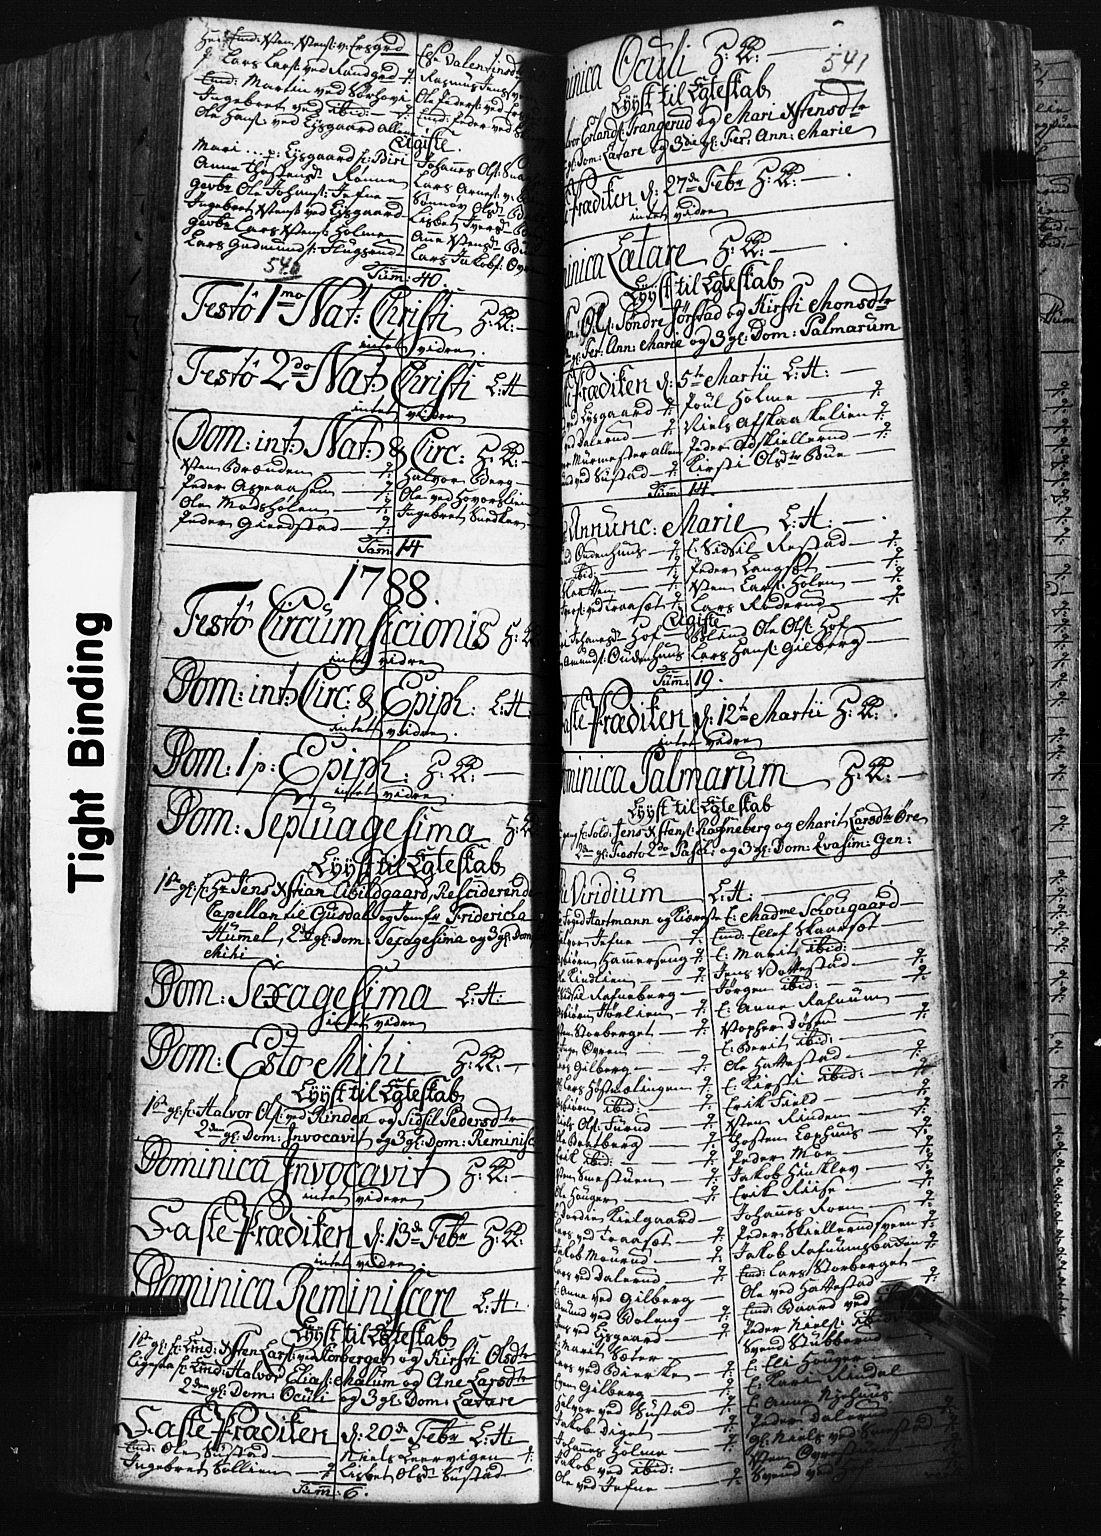 SAH, Fåberg prestekontor, Klokkerbok nr. 3, 1768-1796, s. 540-541